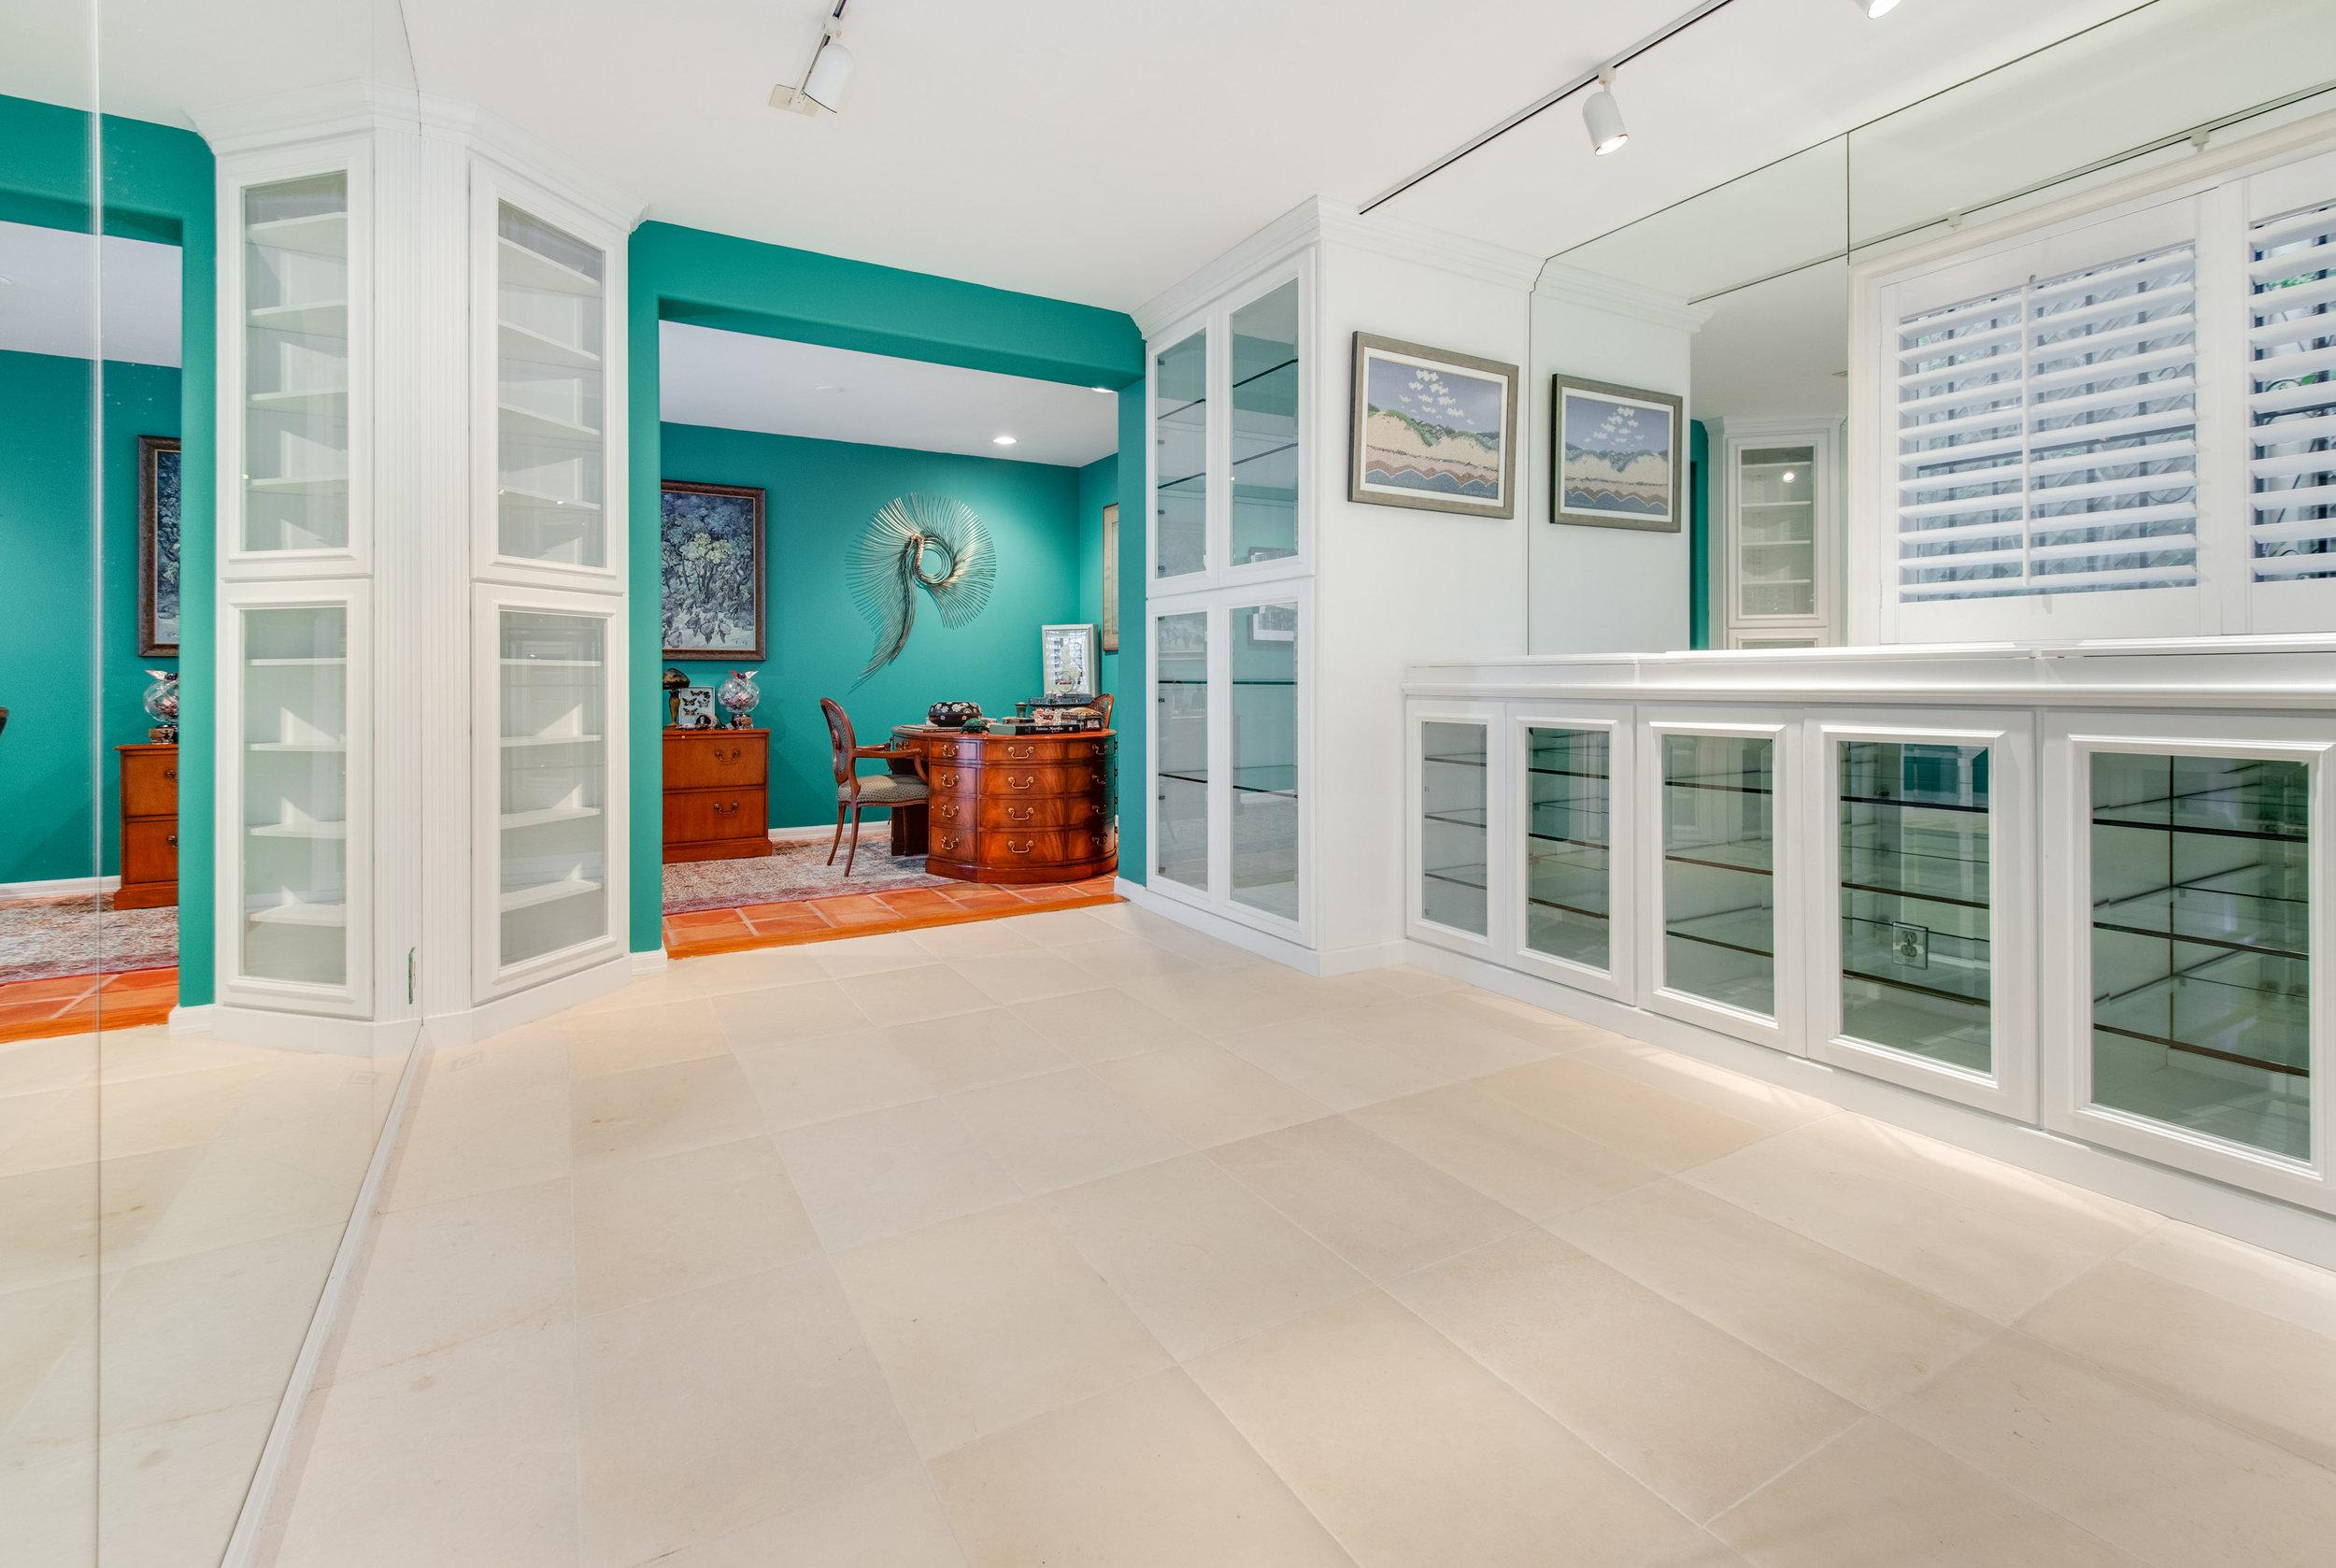 010.5 room Malibu For Sale Lease The Malibu Life Team Luxury Real Estate.jpg